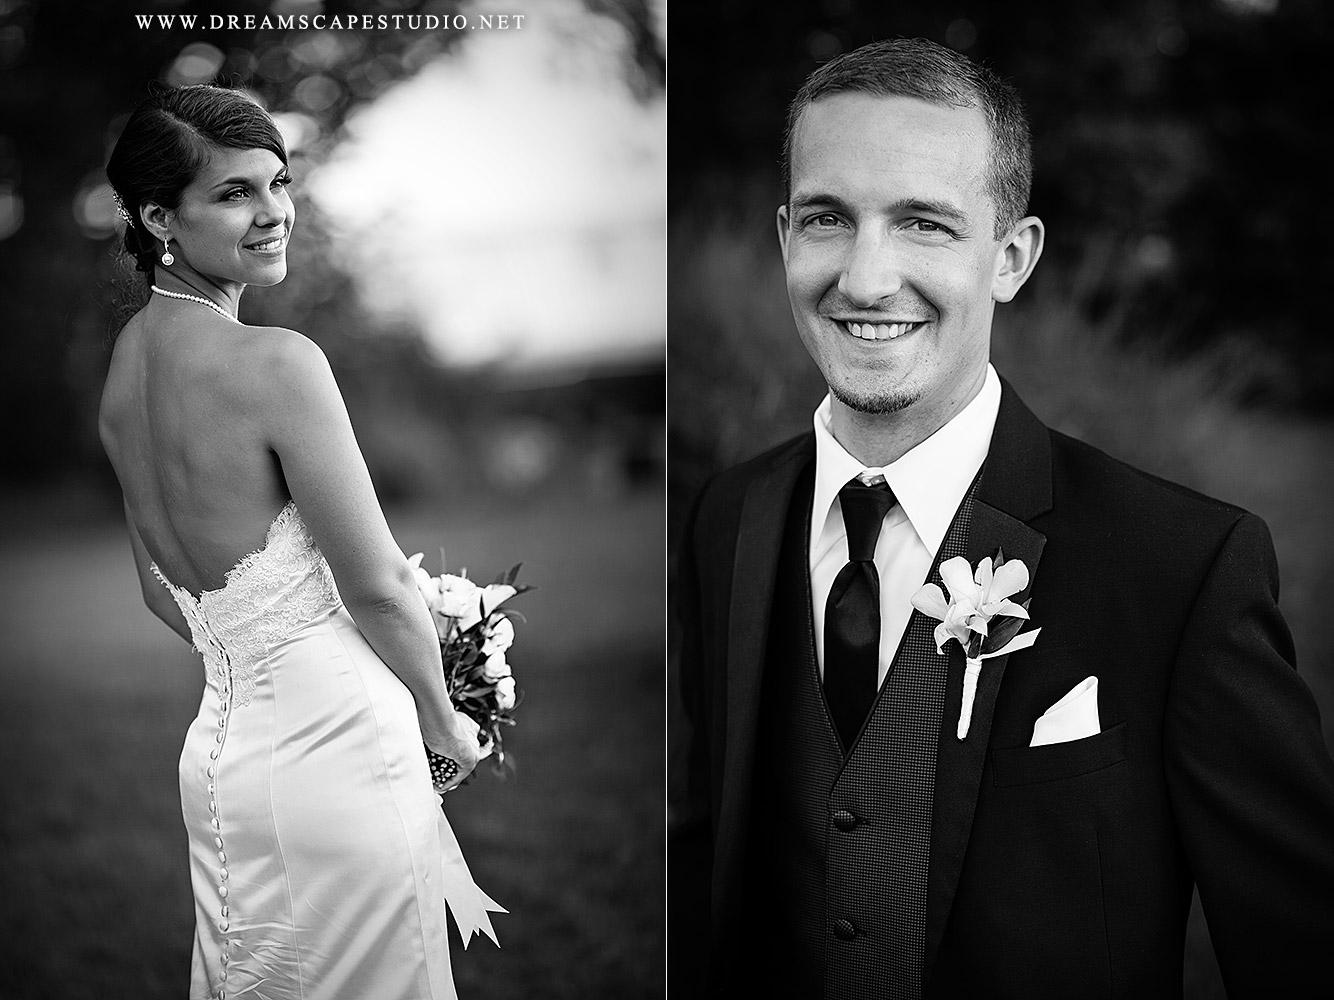 CT_Wedding_Photography_Liz_Justin_31LiJu.jpg